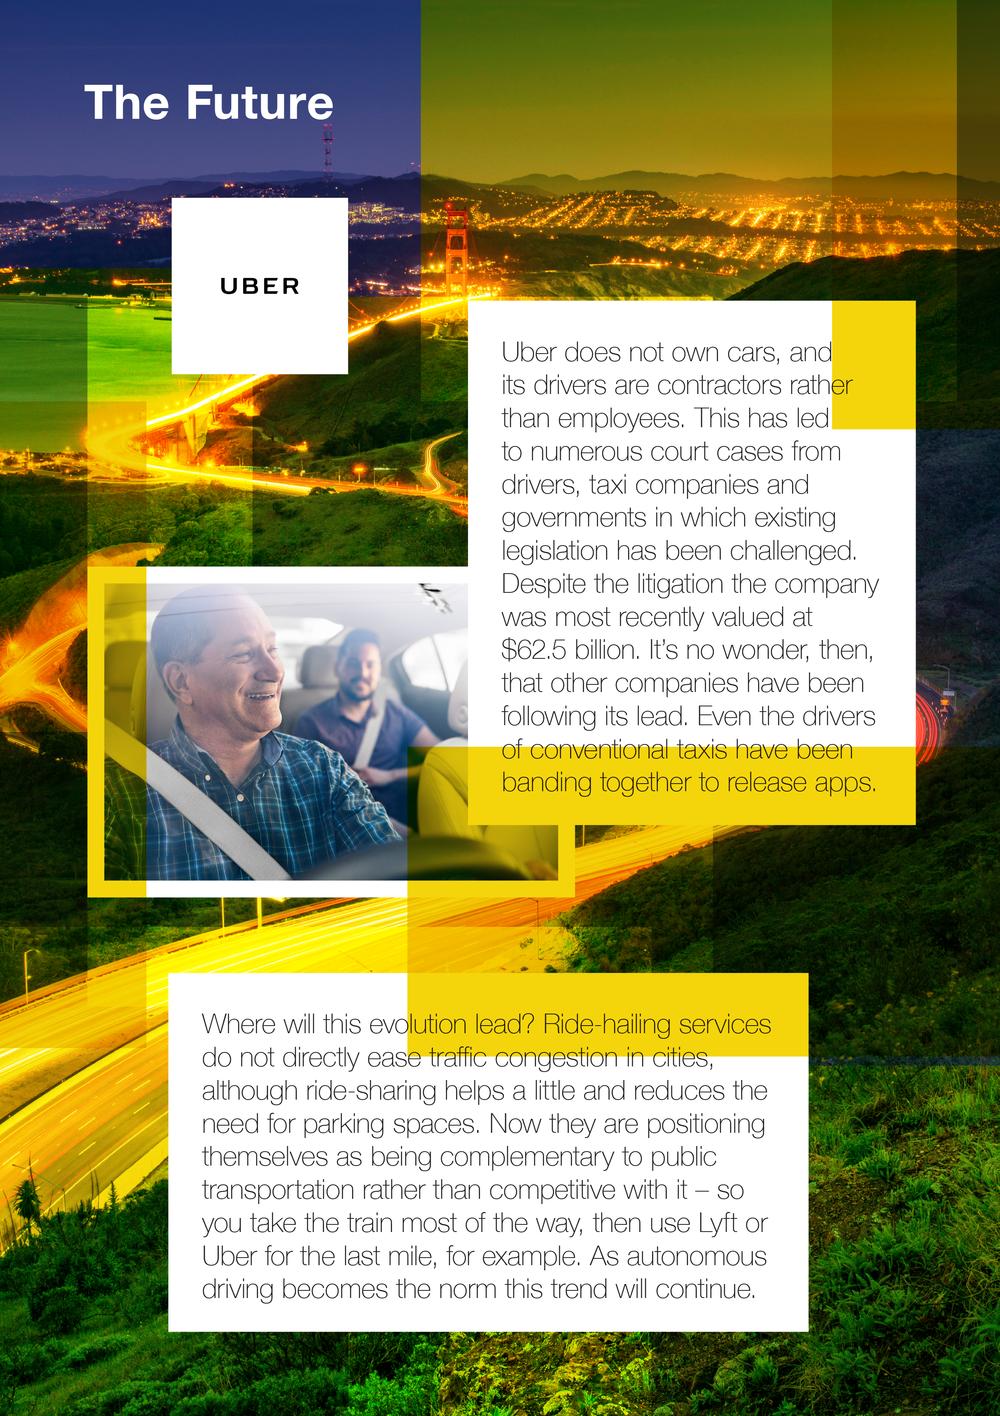 US0155_Duke_Eon_1a_Uber_v2_hr-3.png